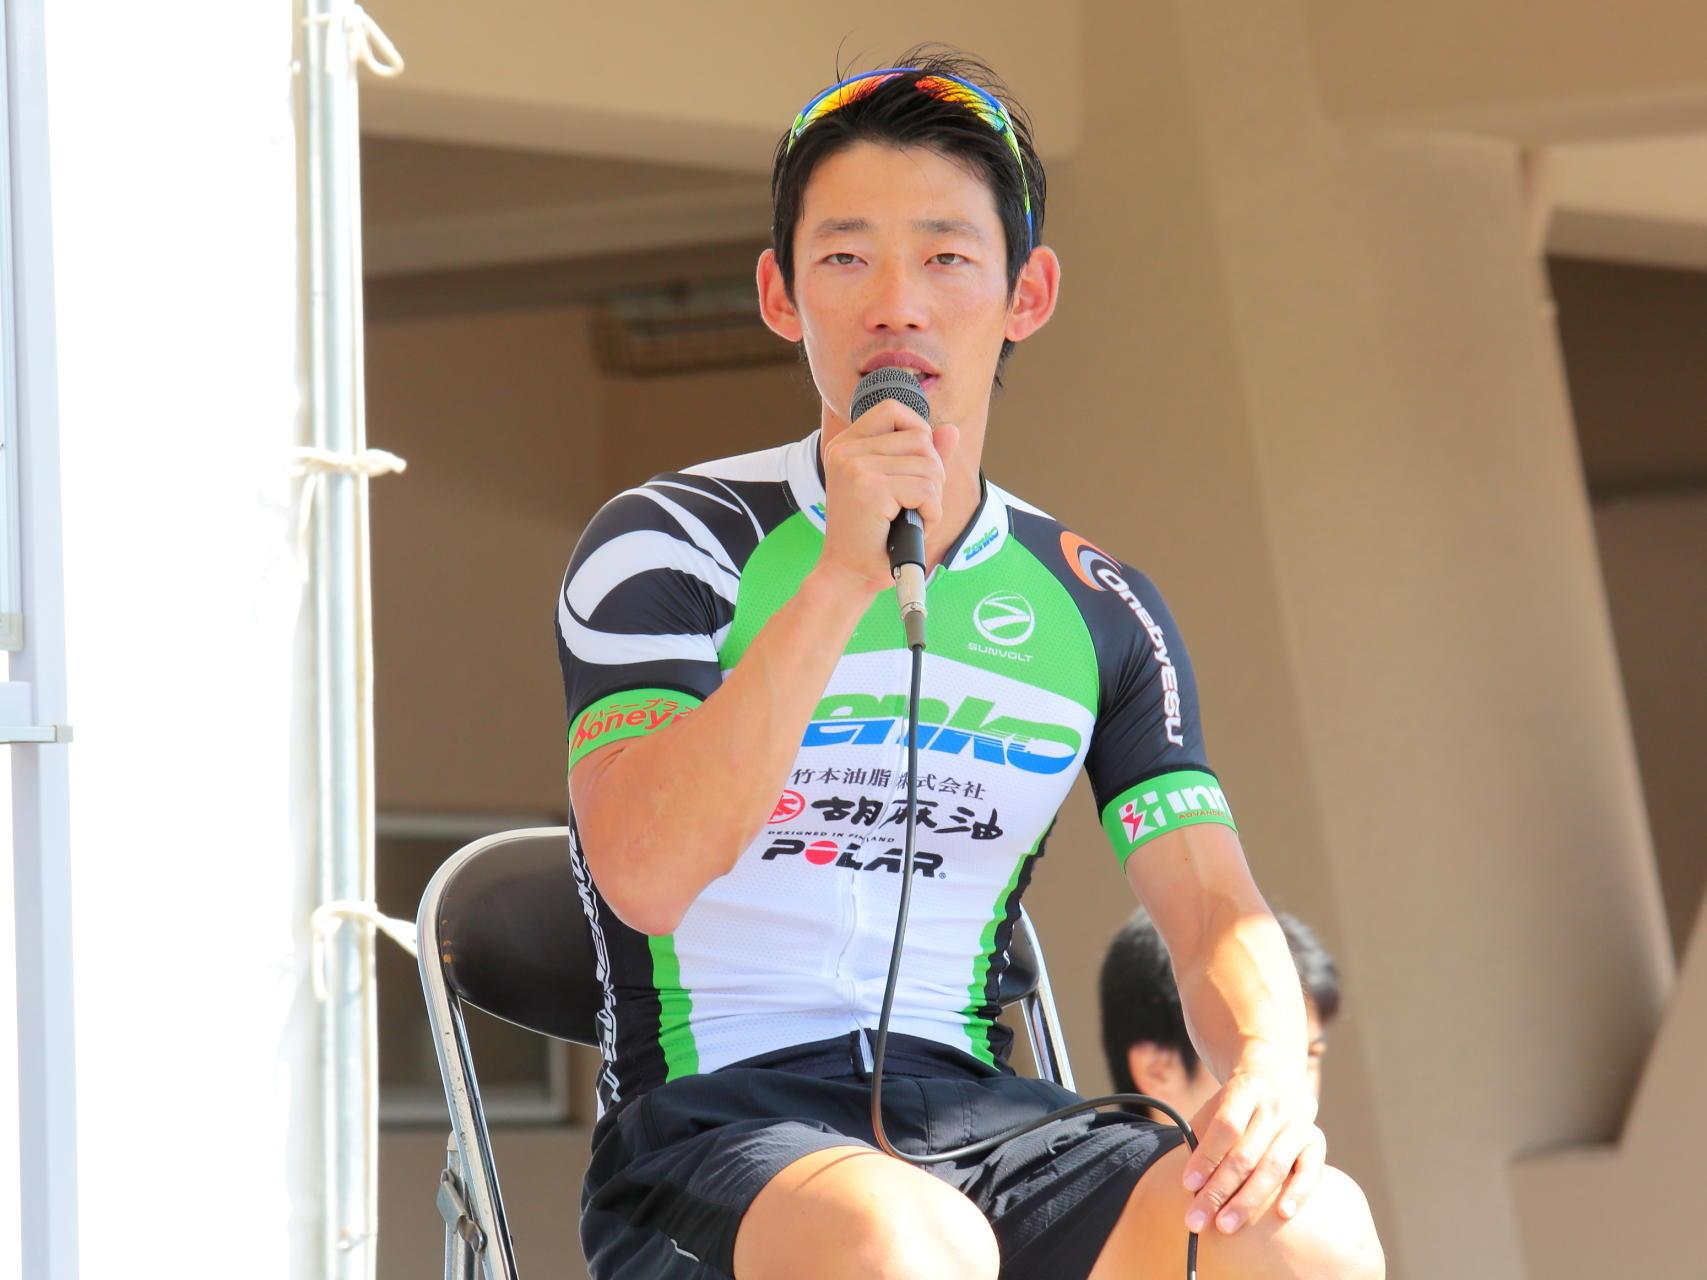 http://news.yoshimoto.co.jp/20171013012235-14e697dfb7c33b7a7e48c3f4982d5e71cda2ade9.jpg